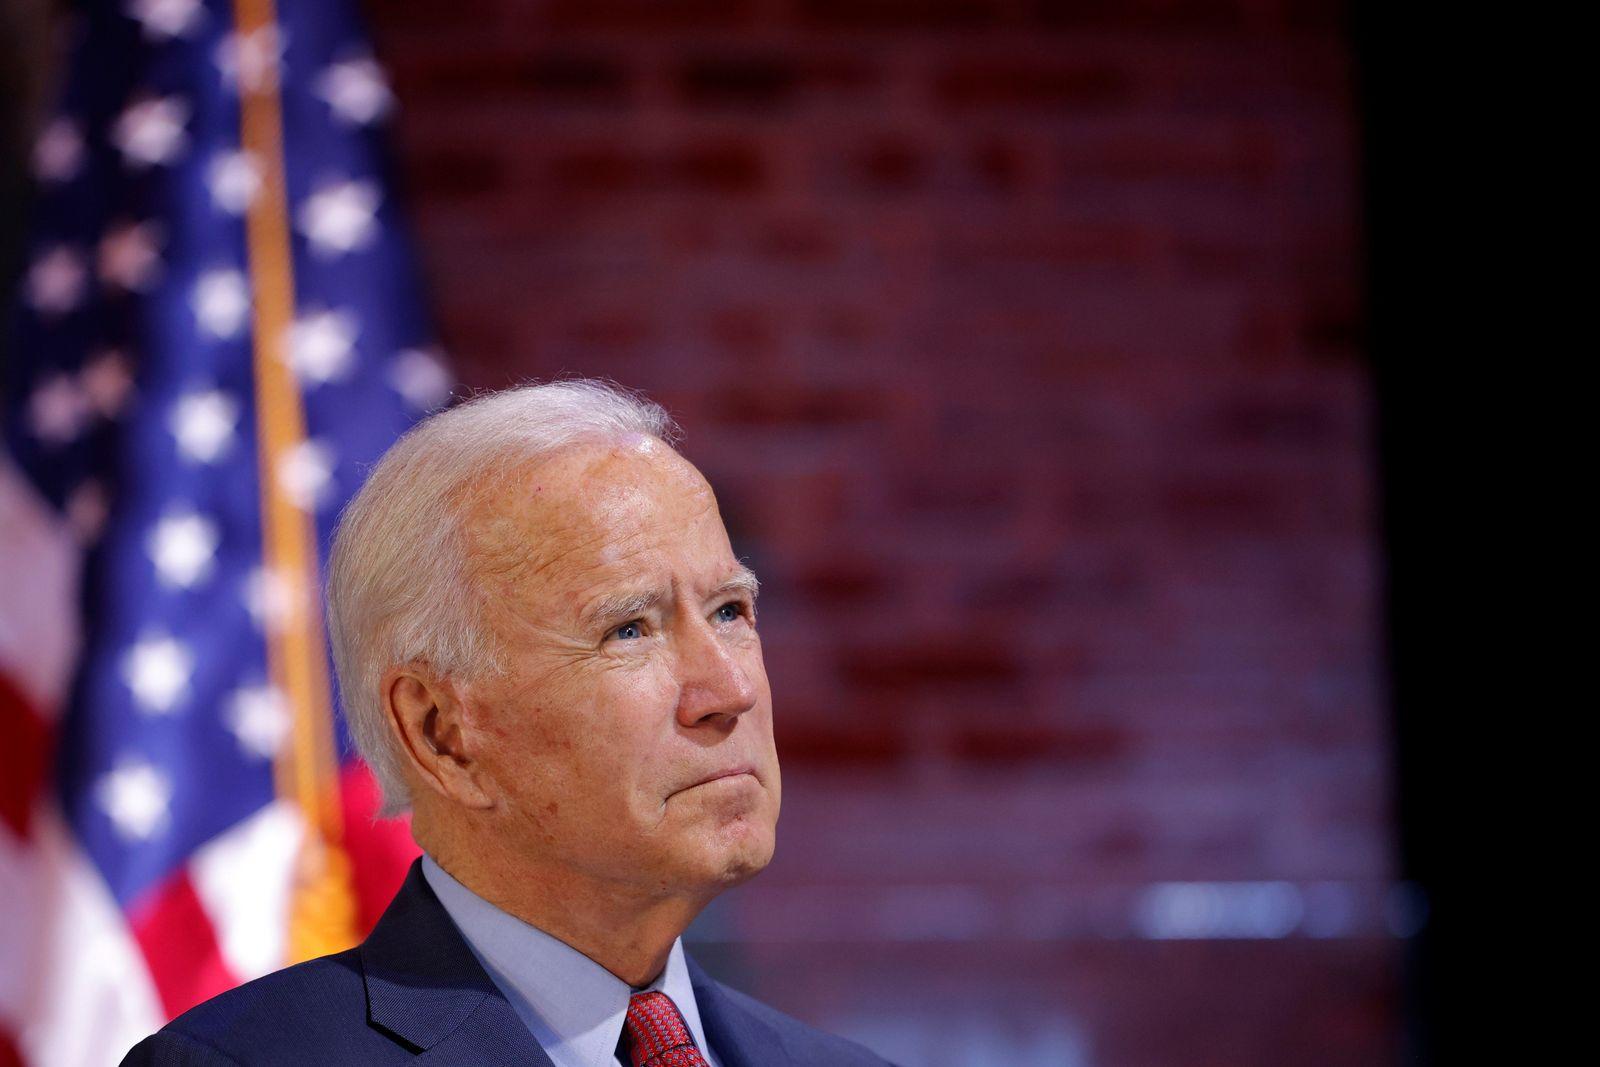 Democratic U.S. presidential nominee Biden takes part in a health briefing in Wilmington